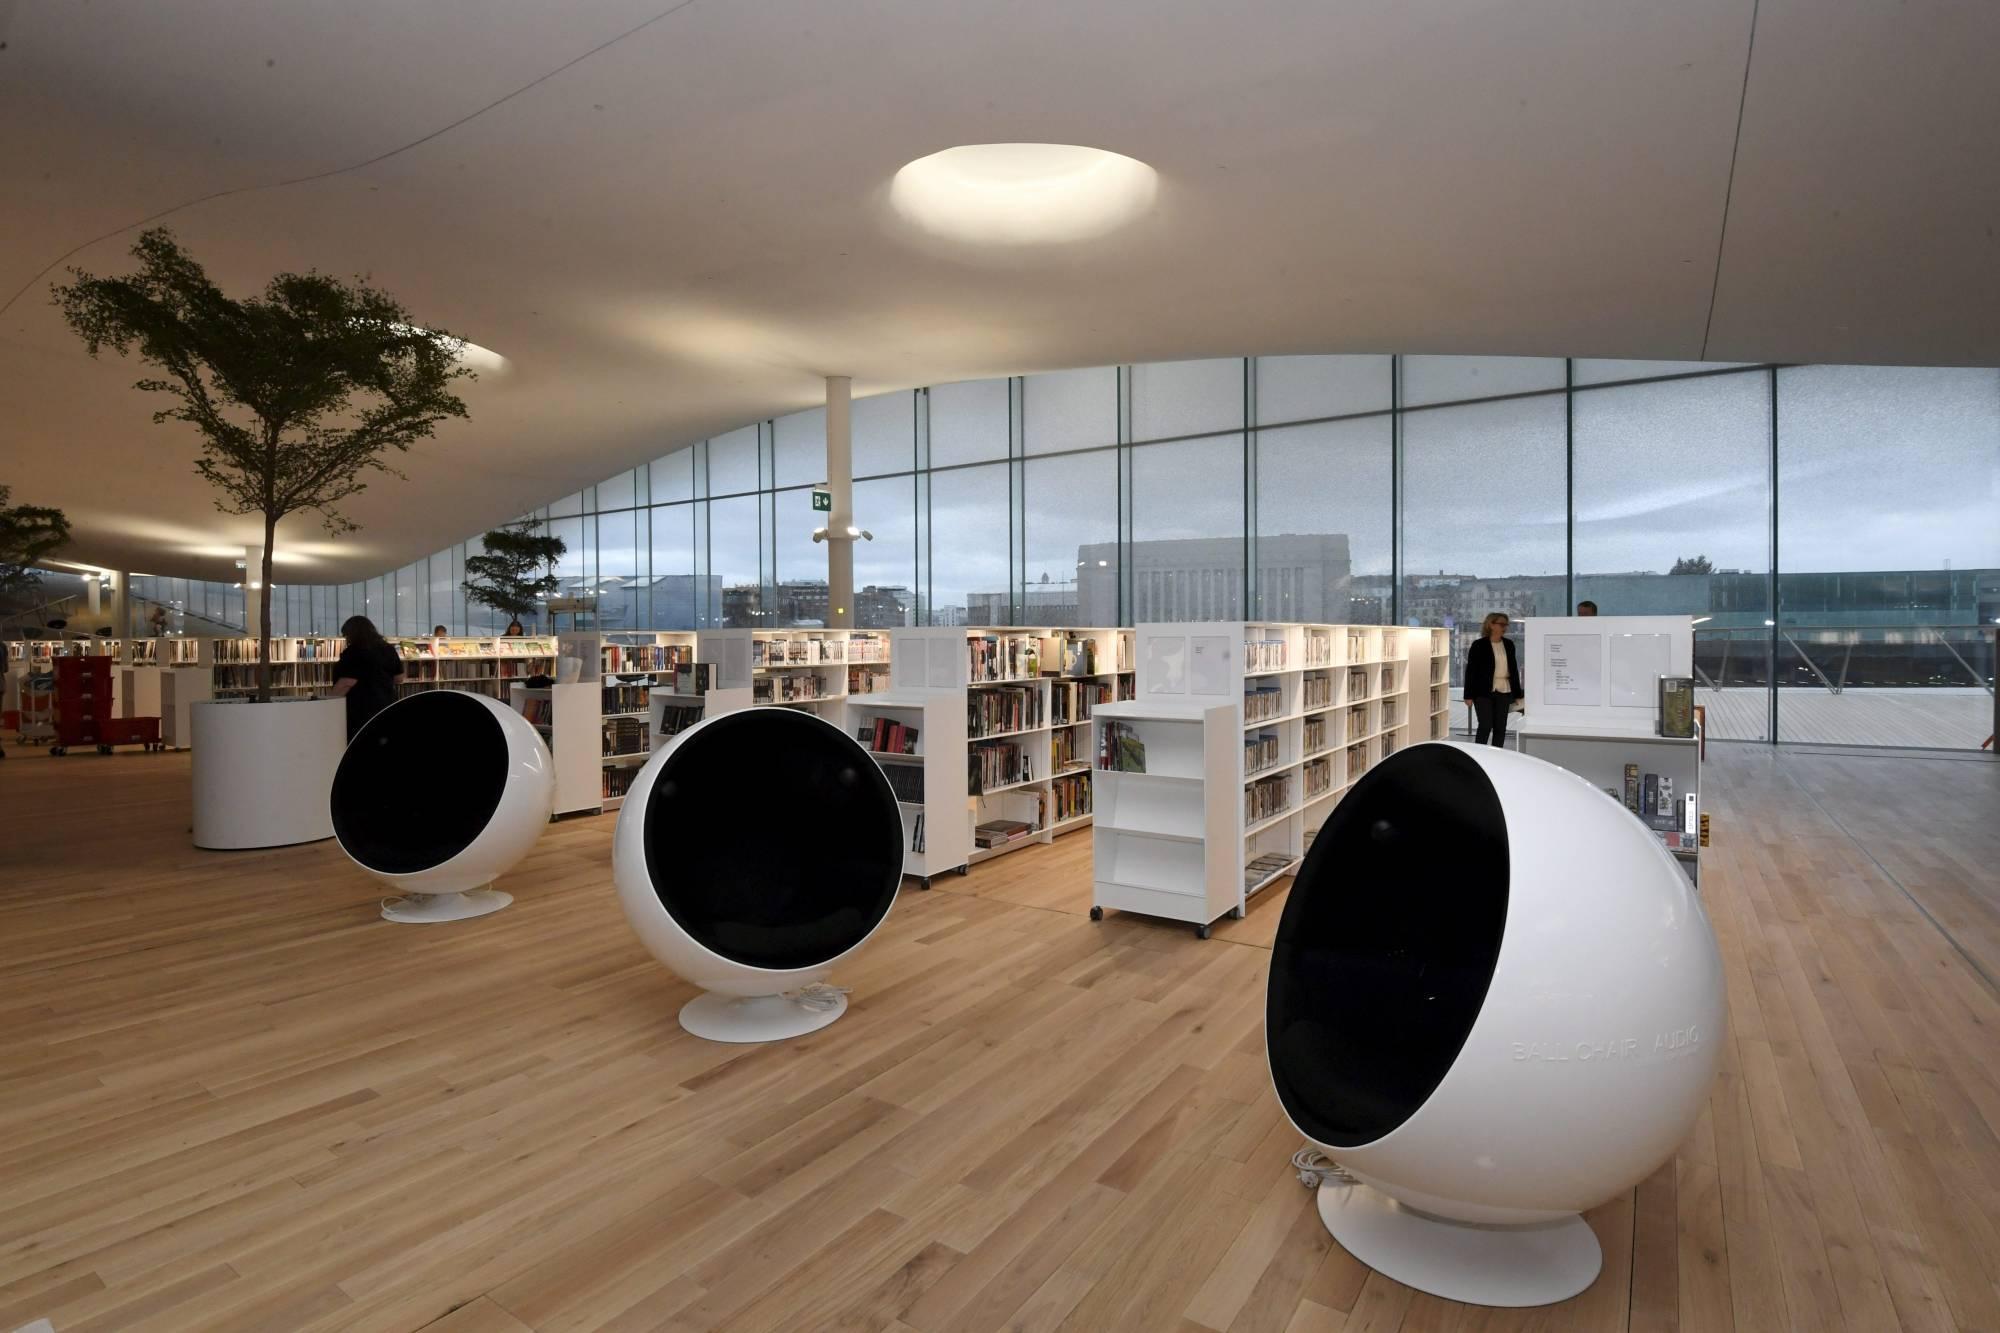 DOUNIAMAG-FINLAND-ARCHITECTURE-MUSEUM-LIBRARY-ROBOTS